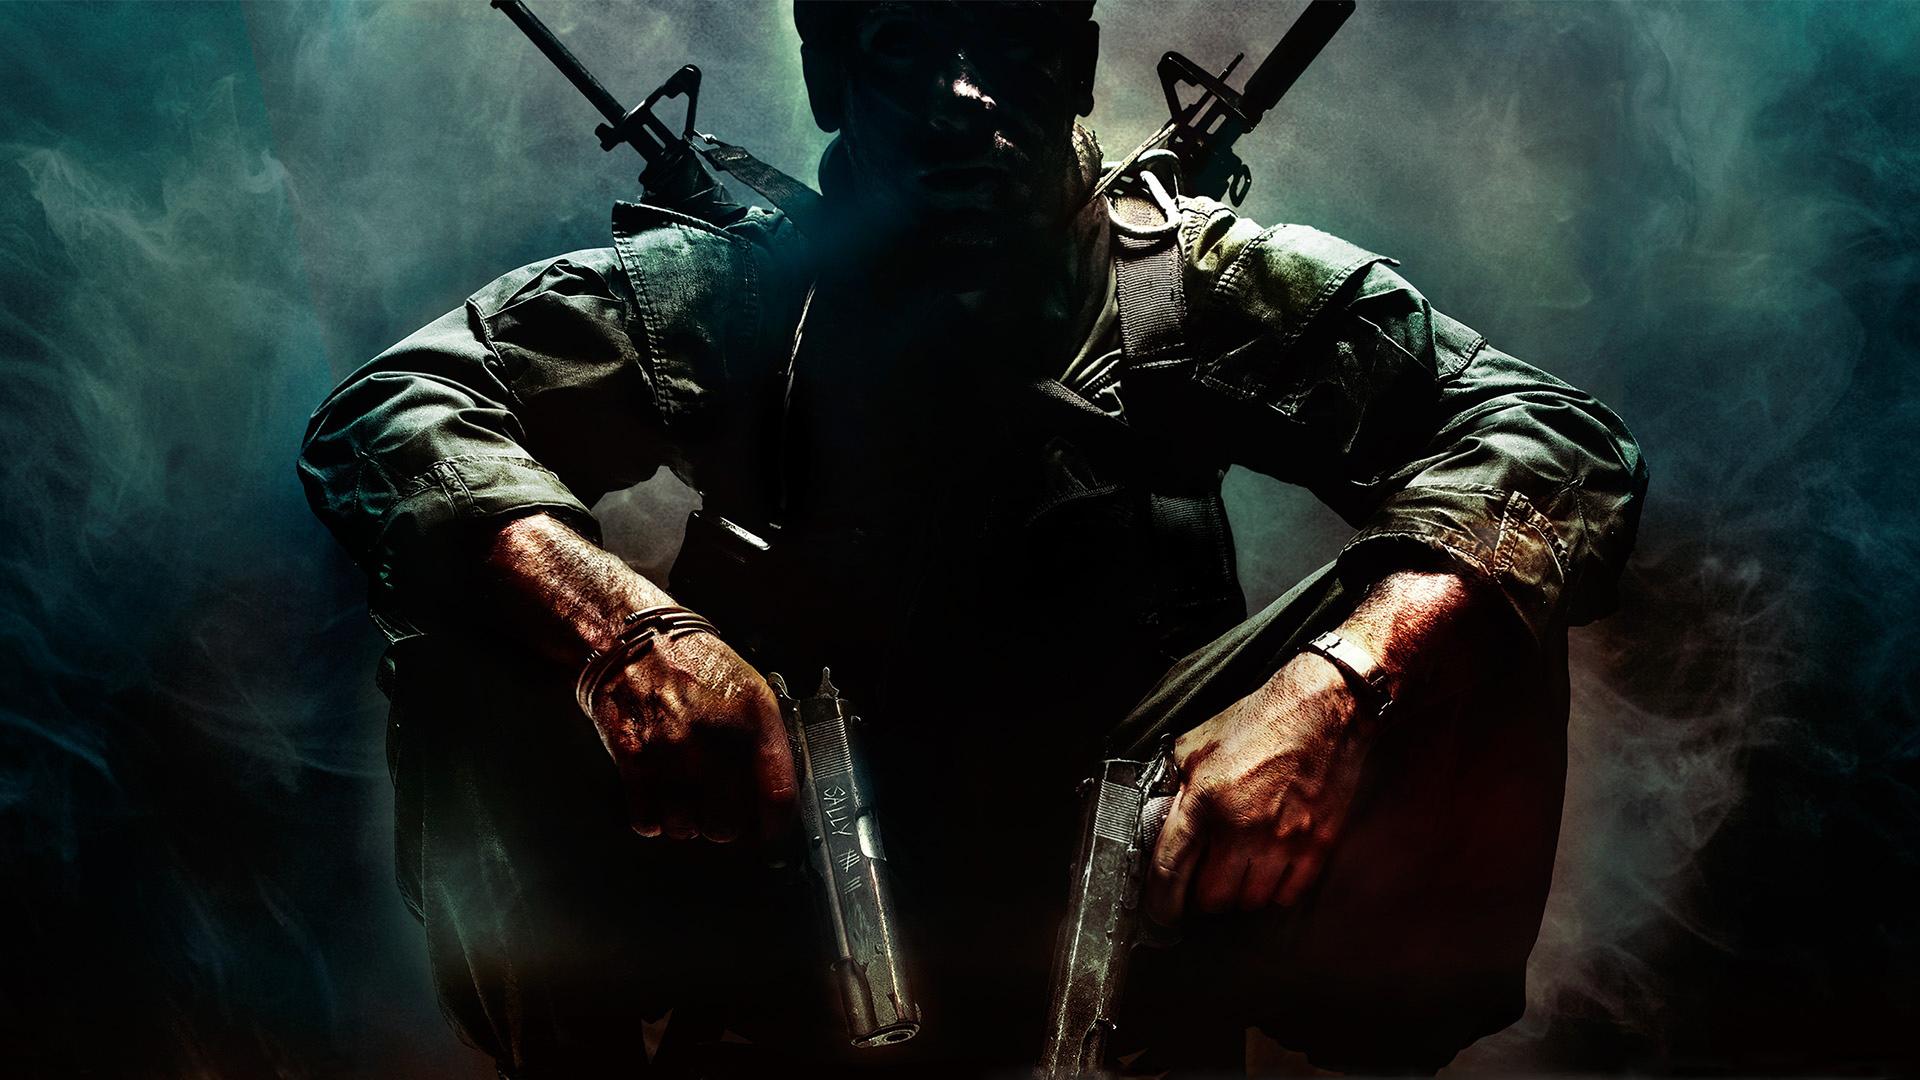 Call-of-duty-black-ops-HD-wallpaper-02